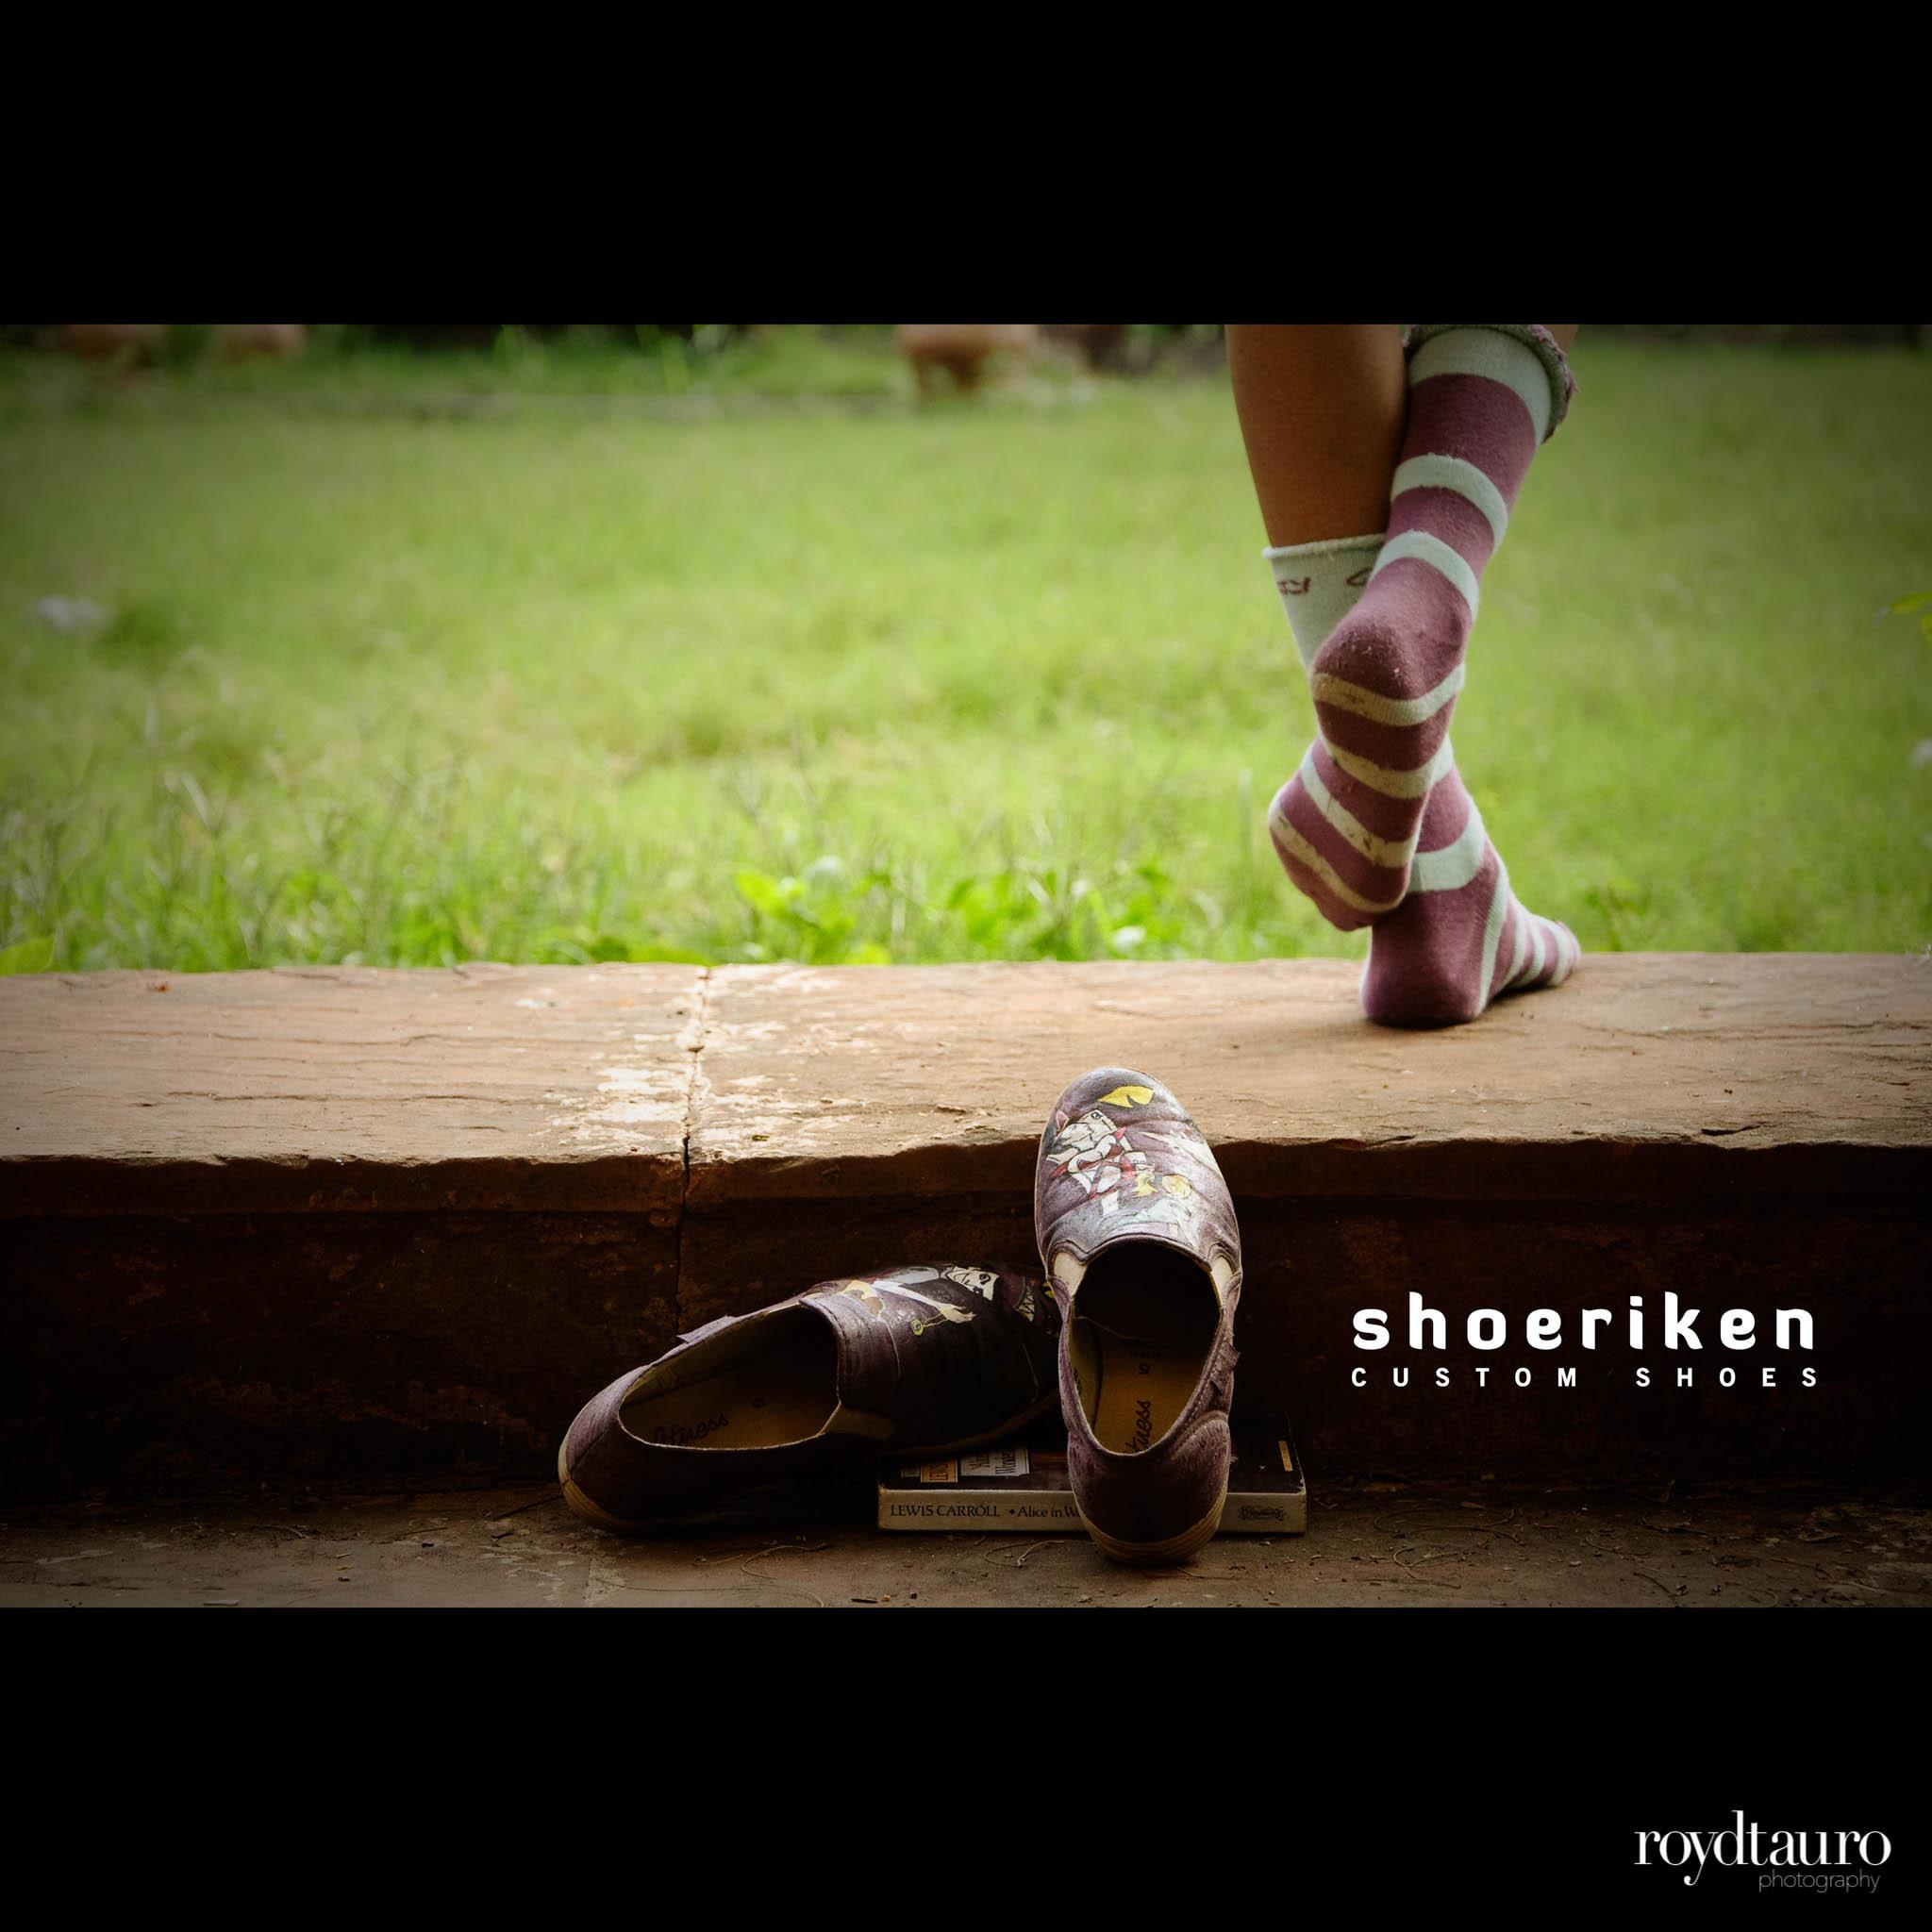 shoeriken-5.jpg